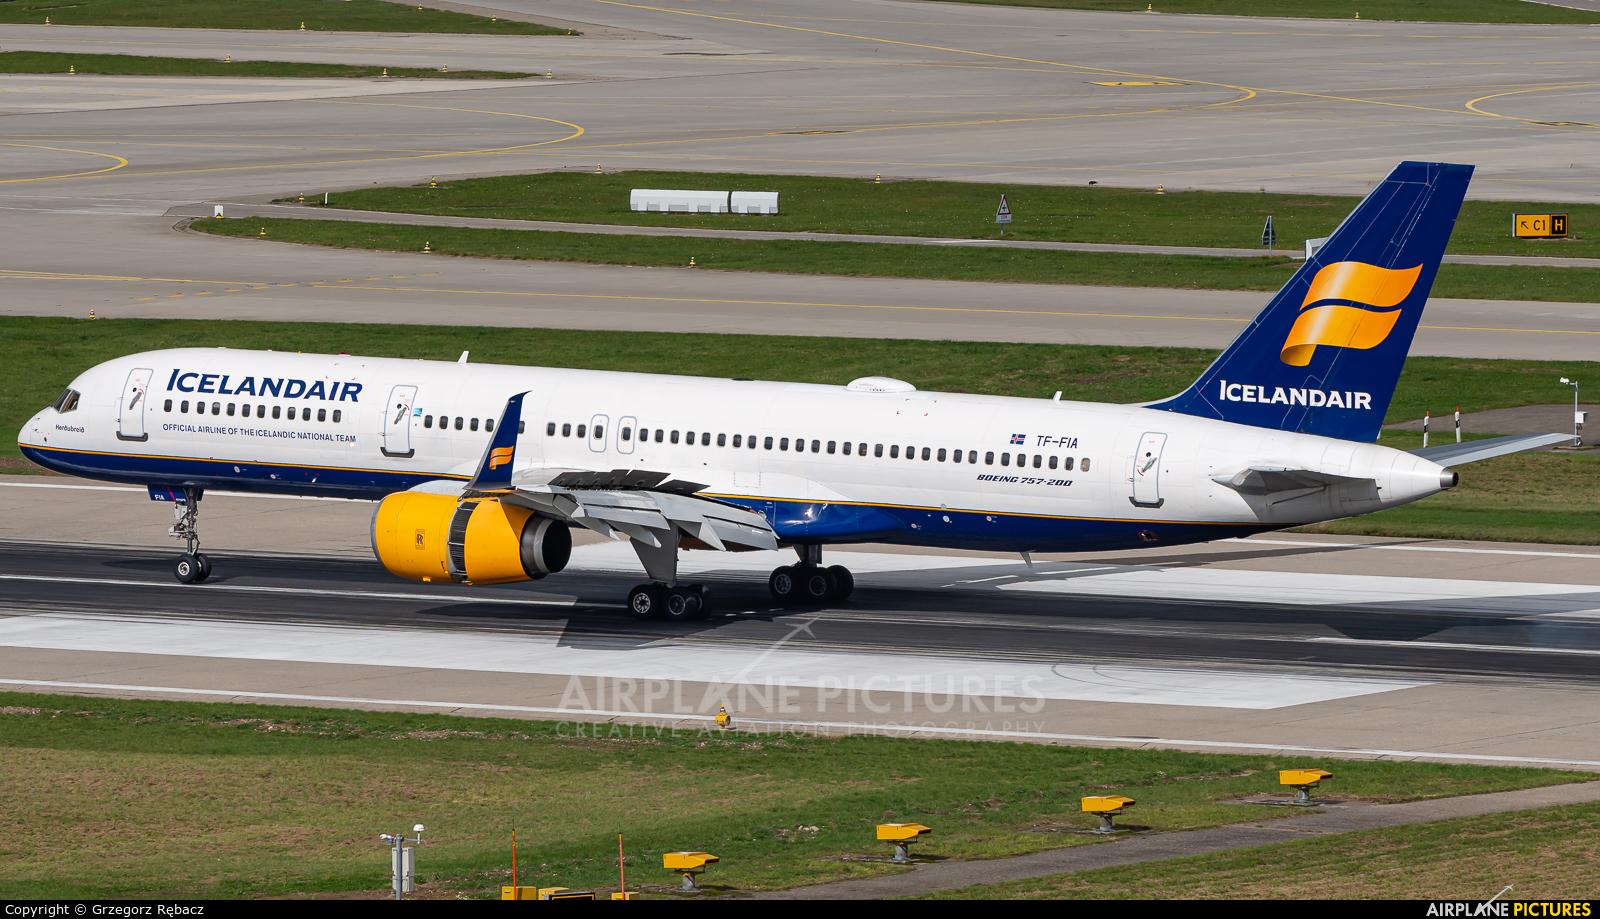 Icelandair TF-FIA aircraft at Zurich